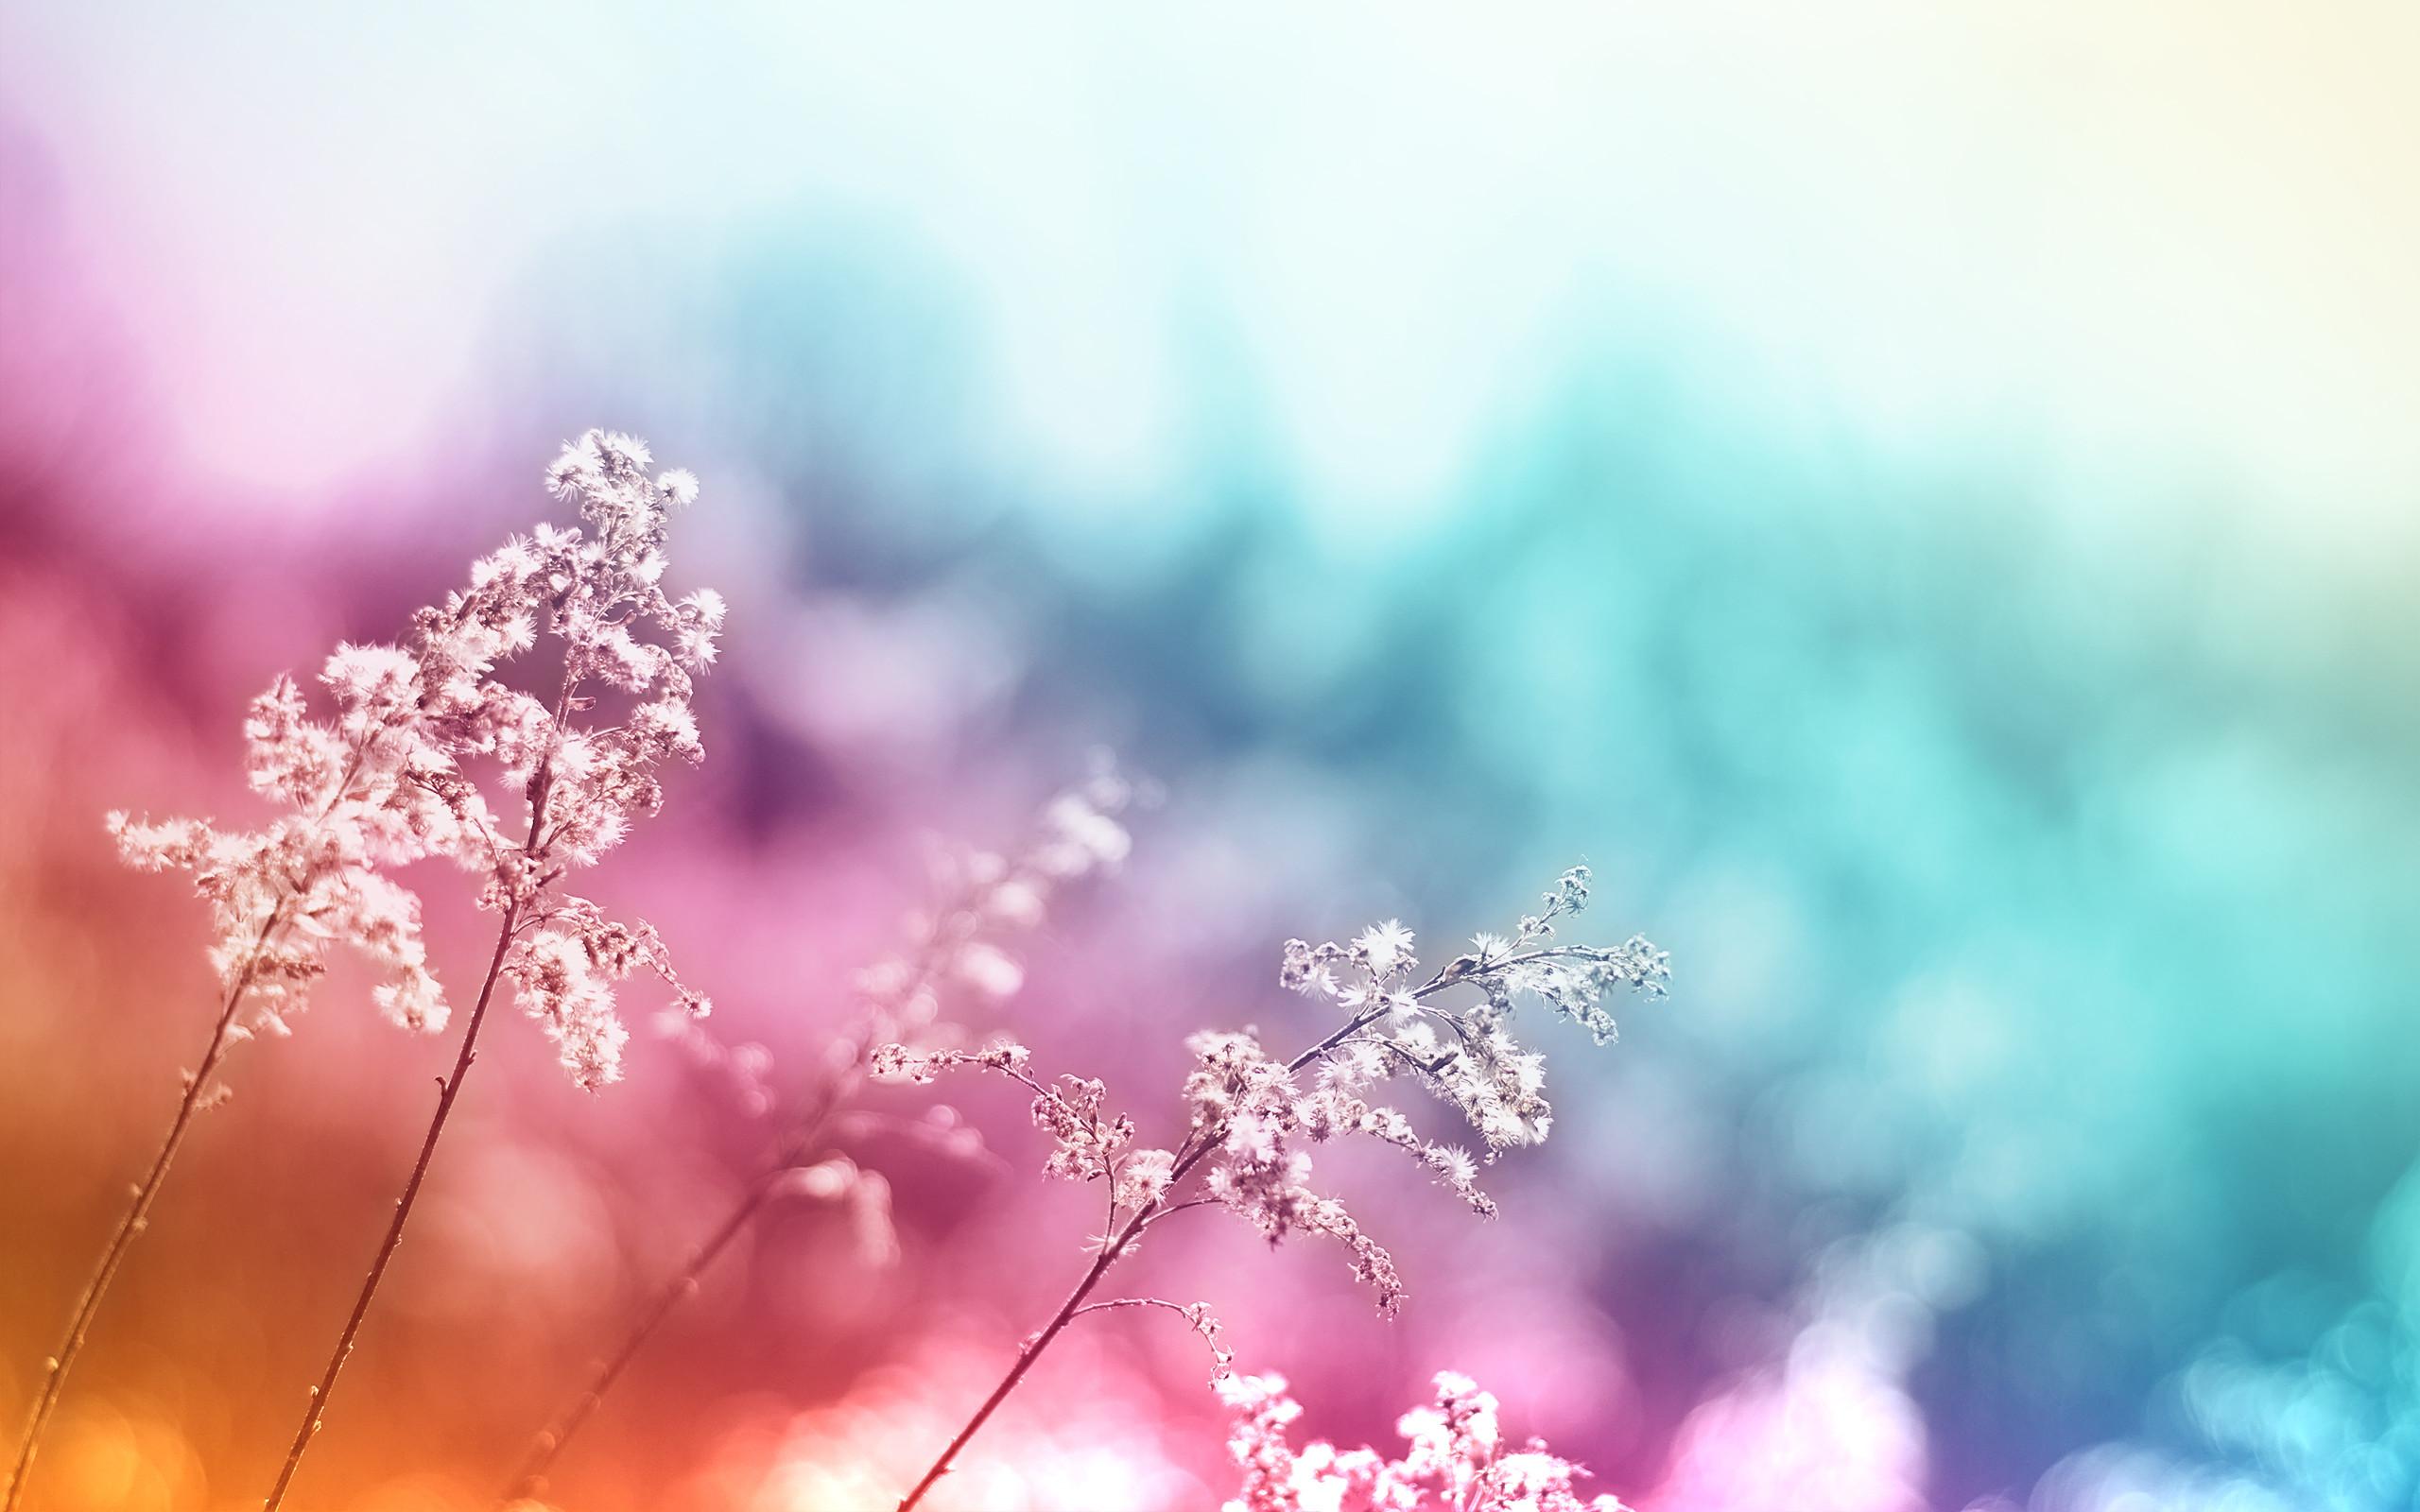 Beautiful colored flower macro wallpaper | Flowers | Pinterest | Wallpaper, Desktop  backgrounds and Wallpaper backgrounds